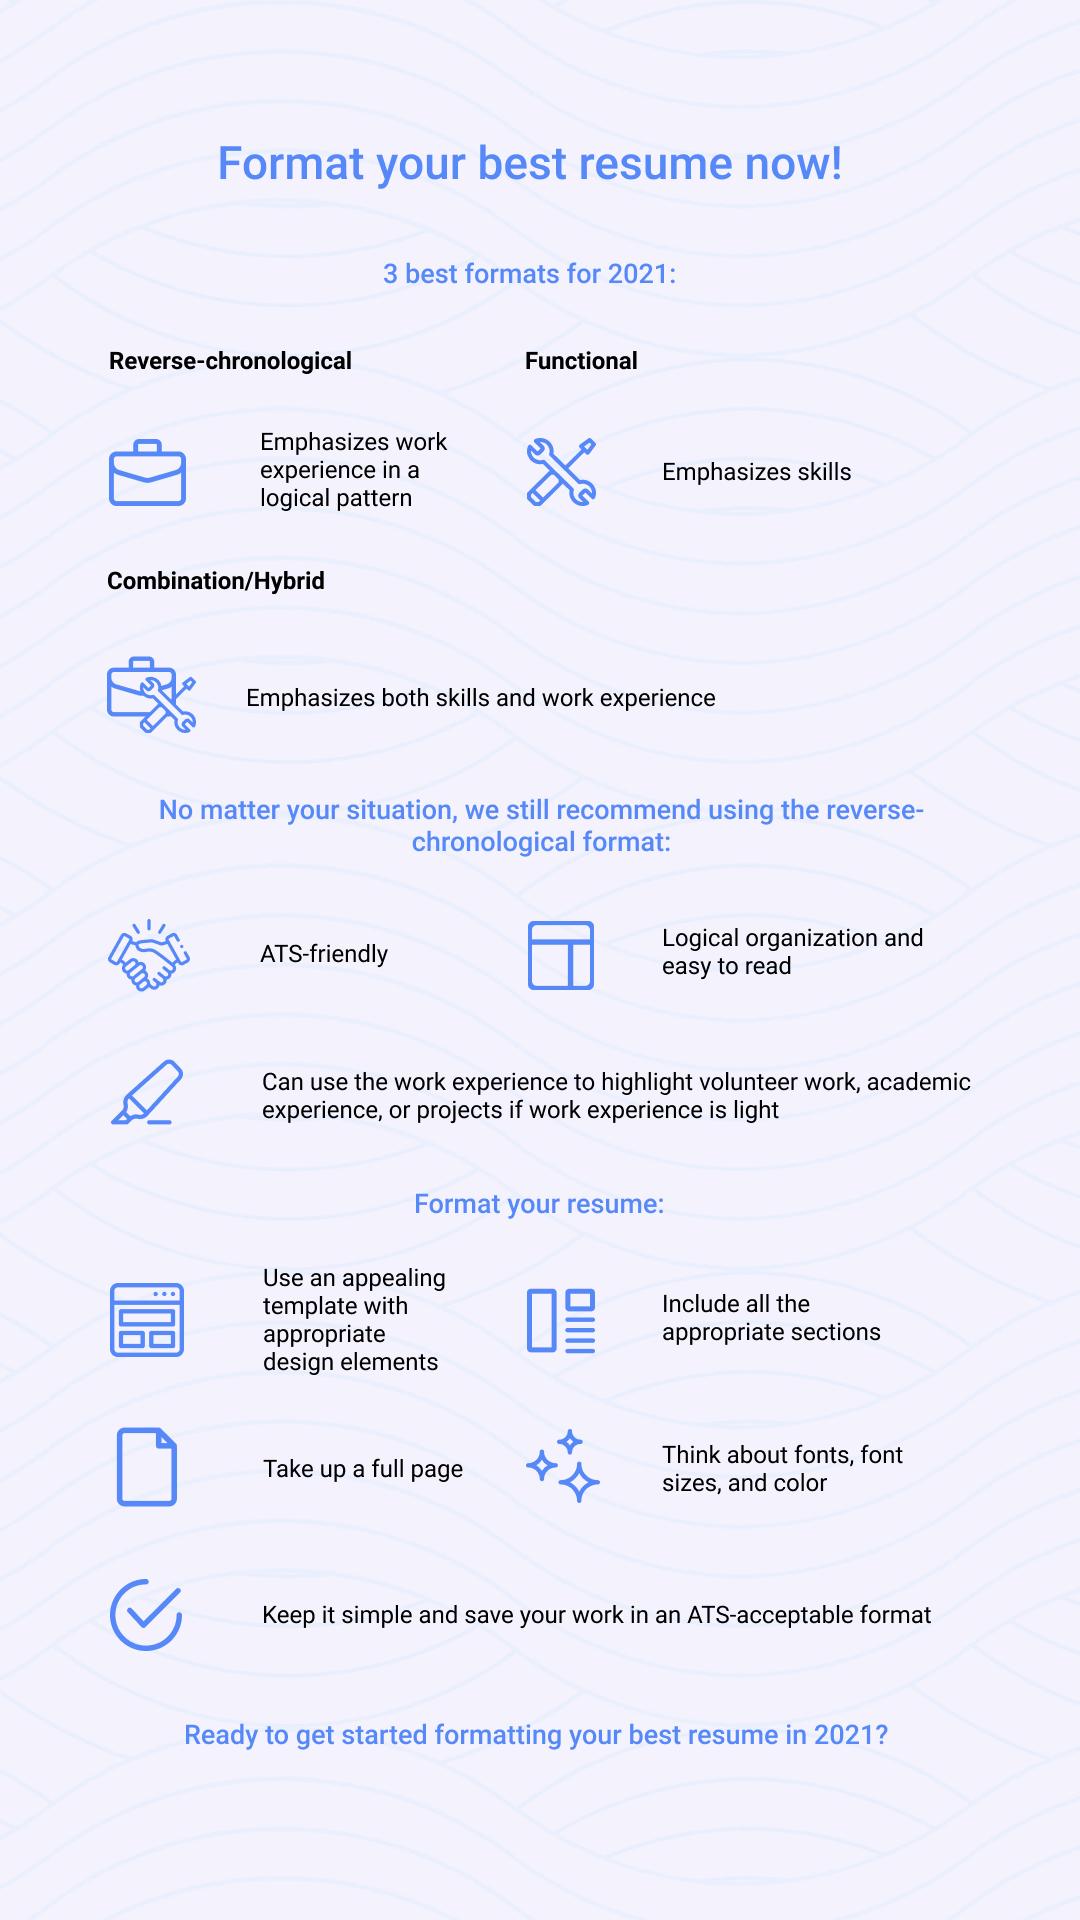 Resume formatting tips for 2021